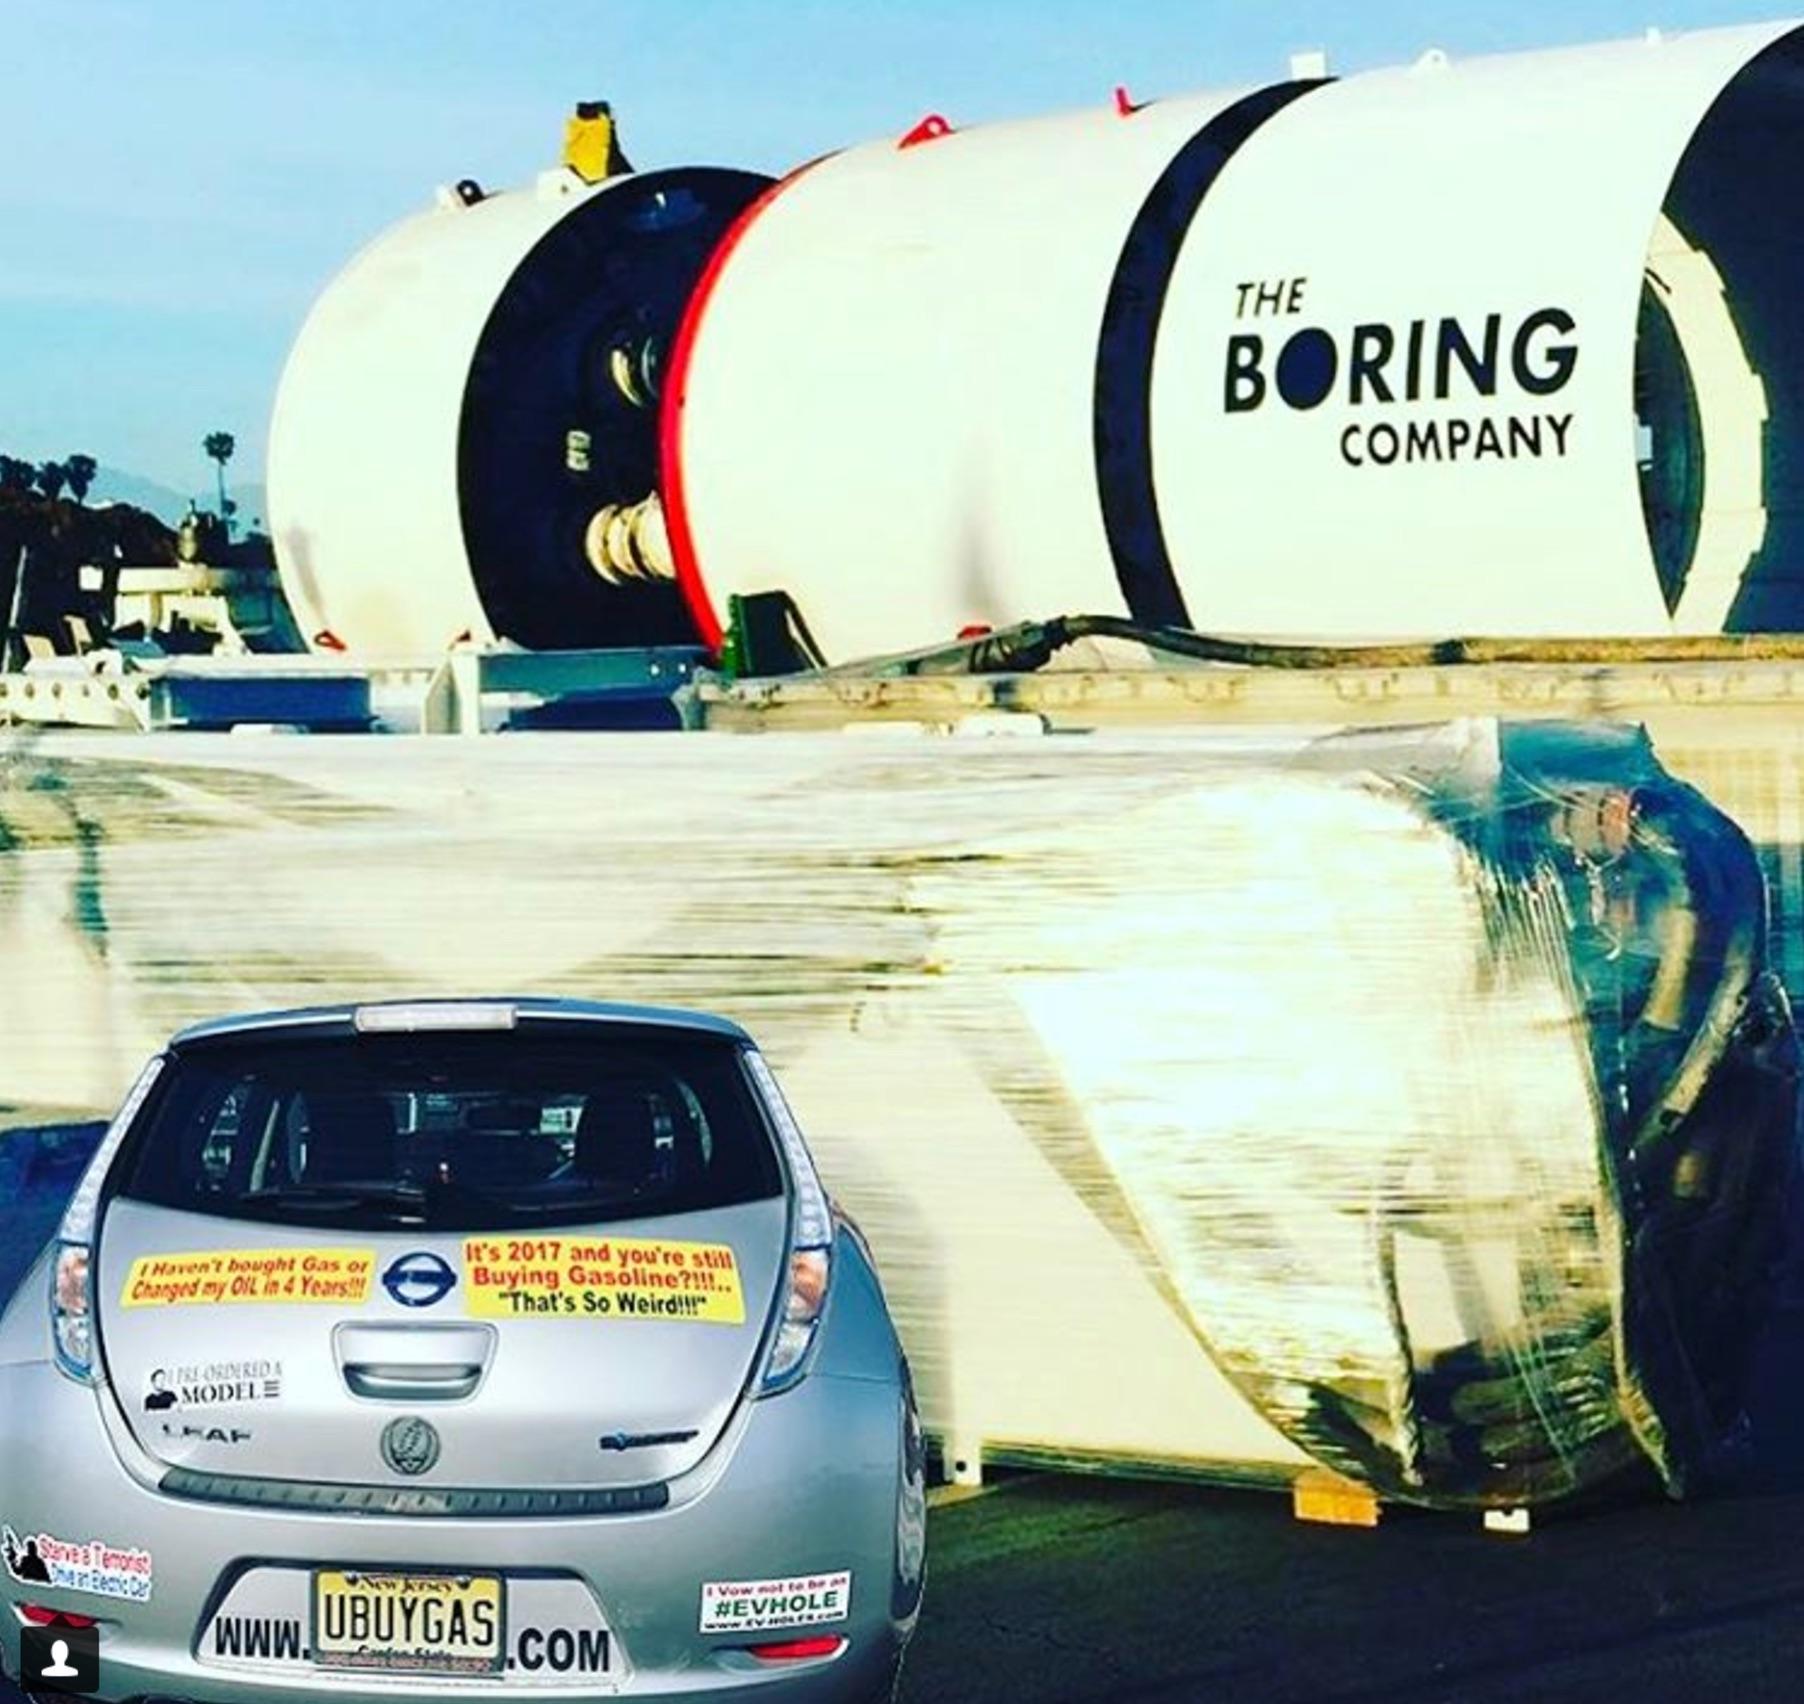 Musk-Boring-Company-equipment-SpaceX-prius